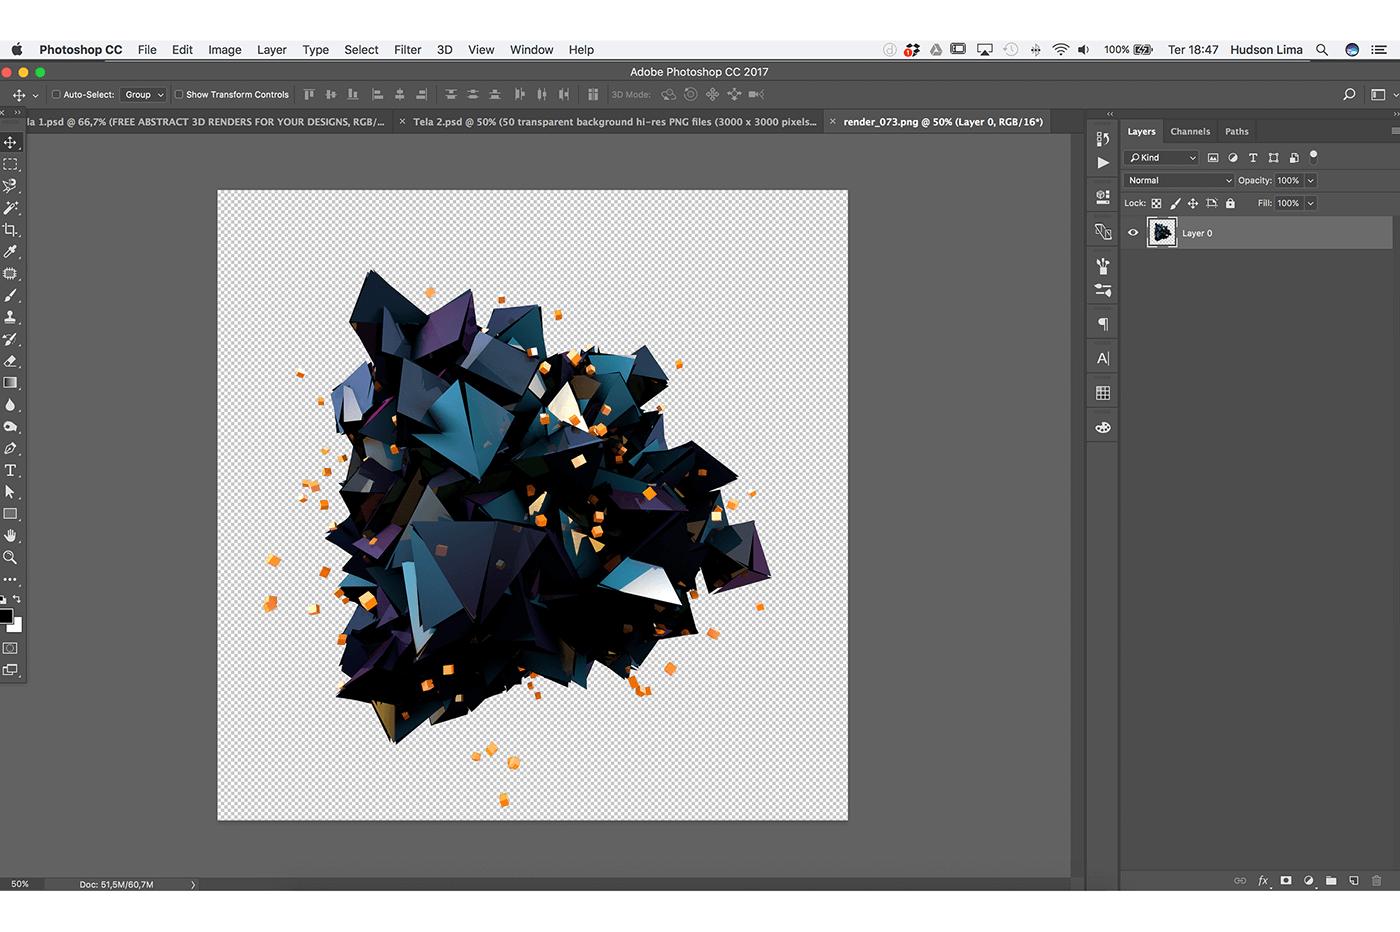 50+ Abstract 3D Shapes tuyệt đẹp cho Photoshop